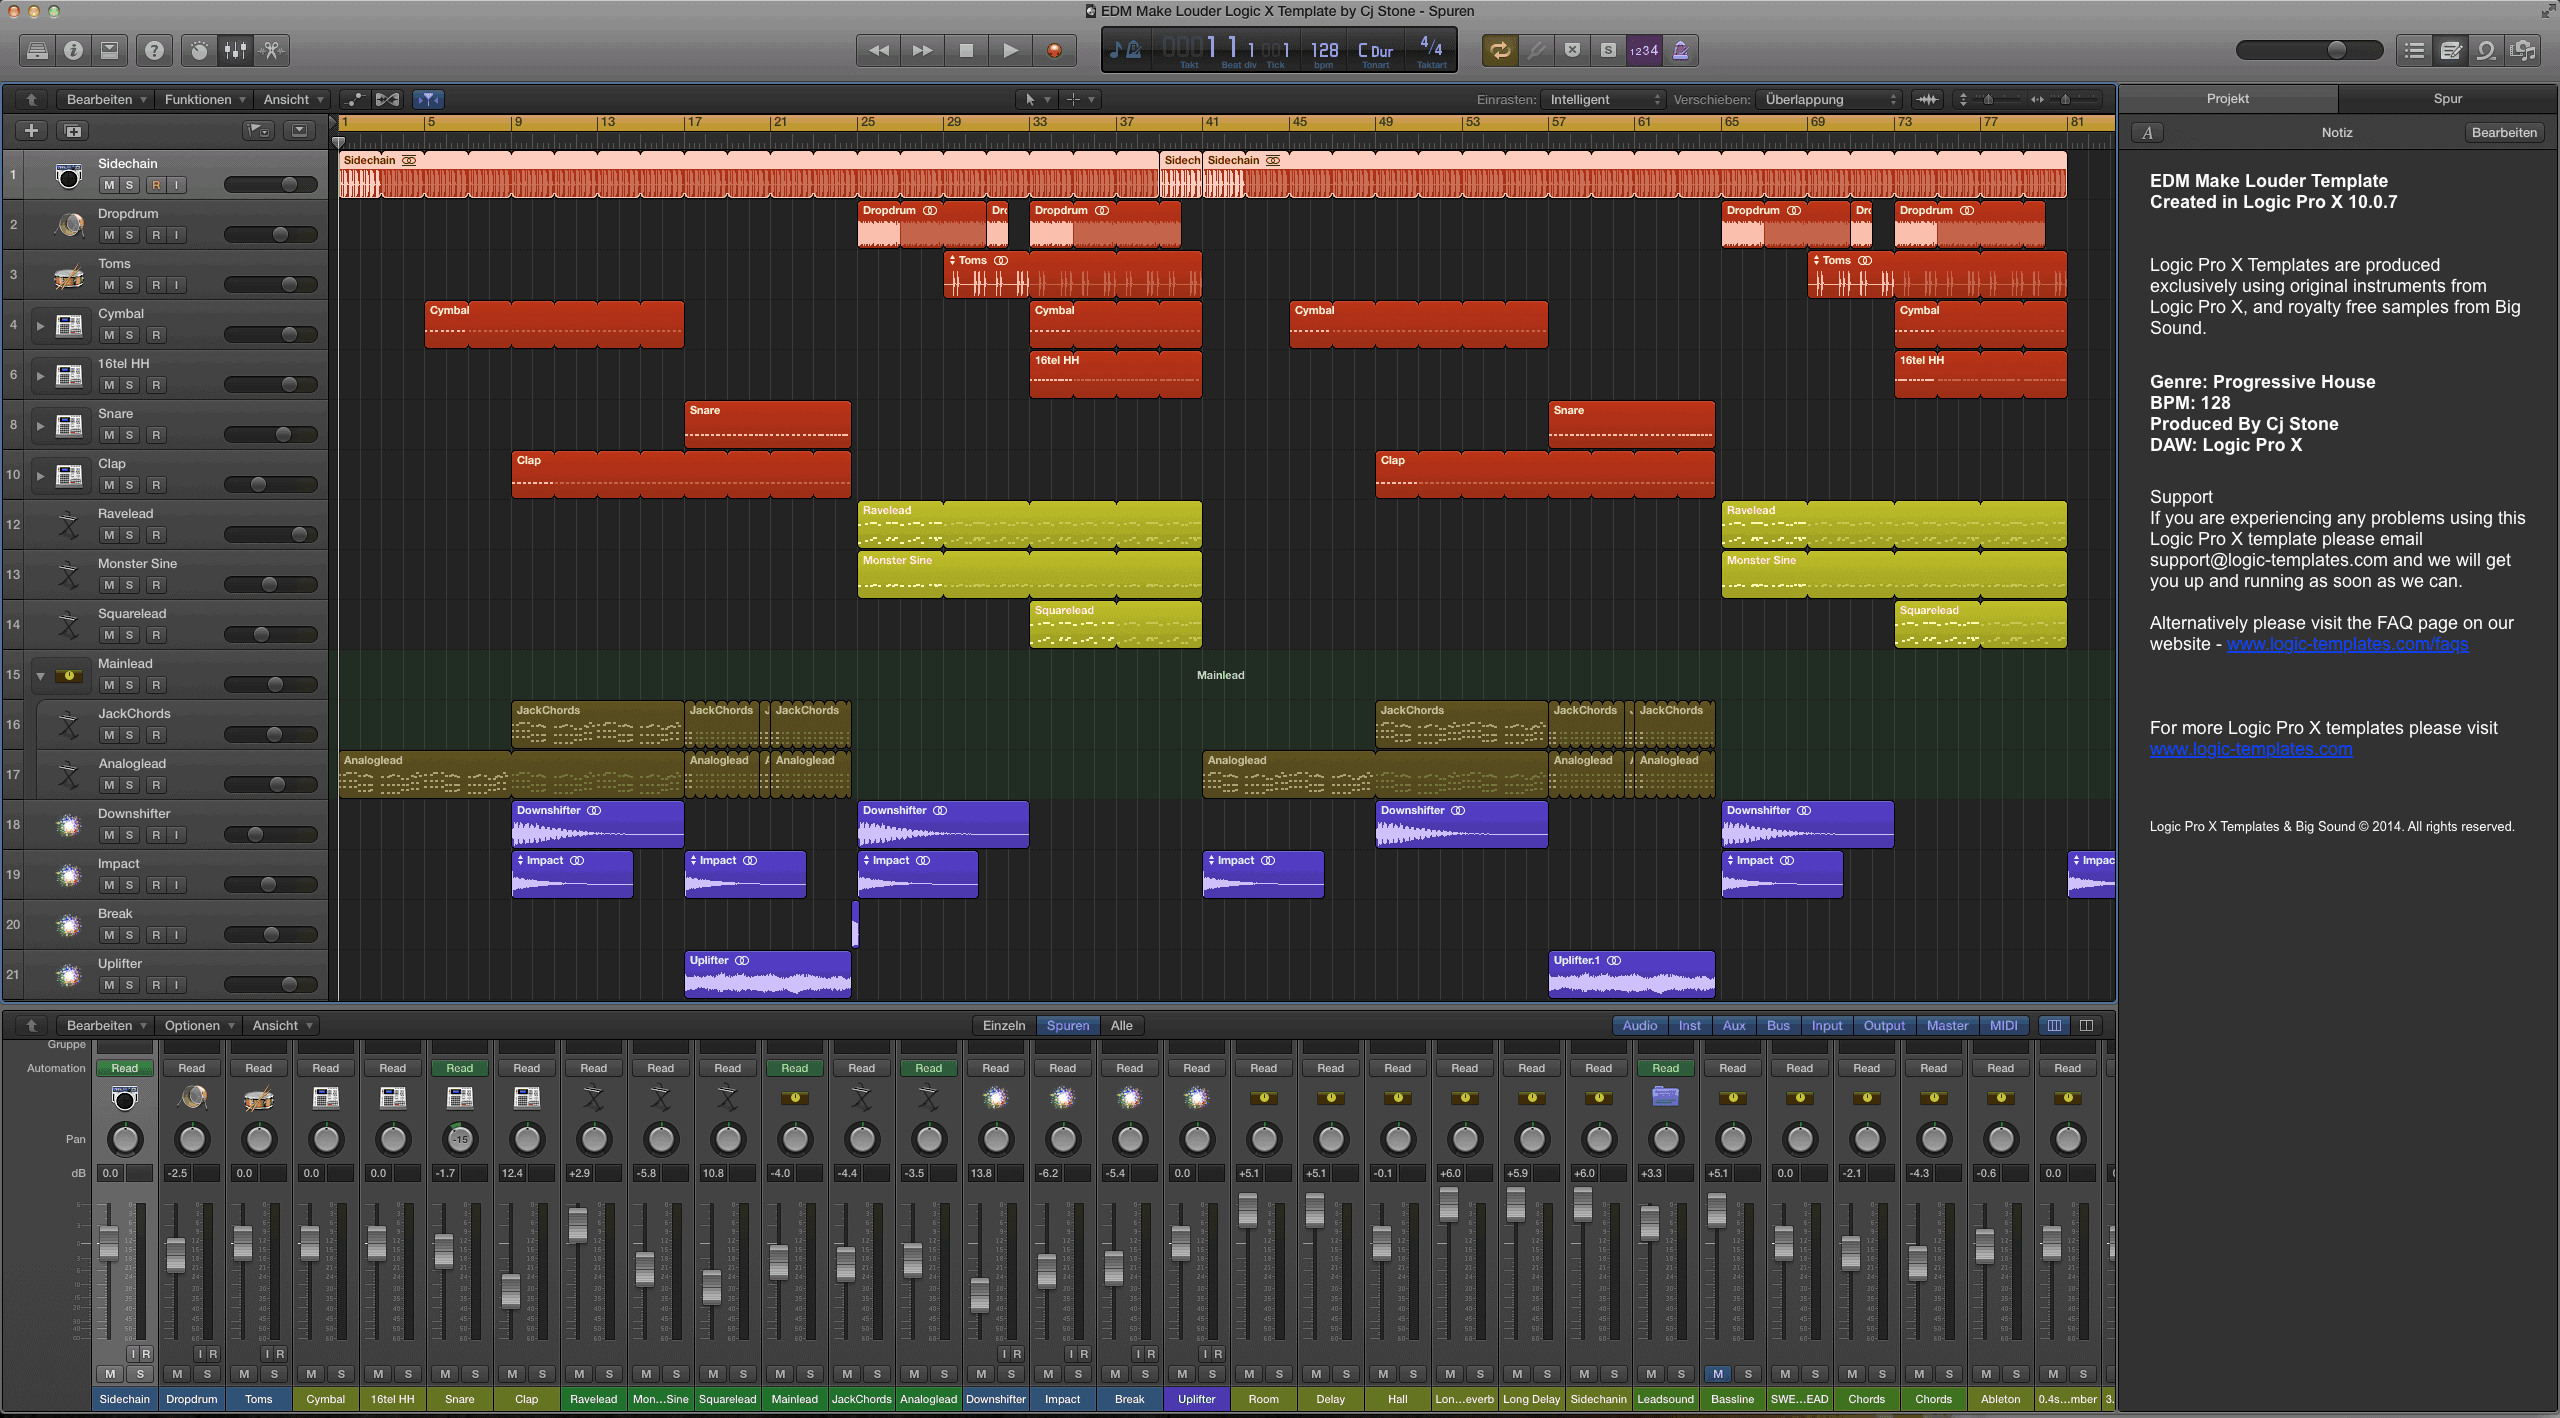 EDM Make Louder Logic X Template by Cj Stone